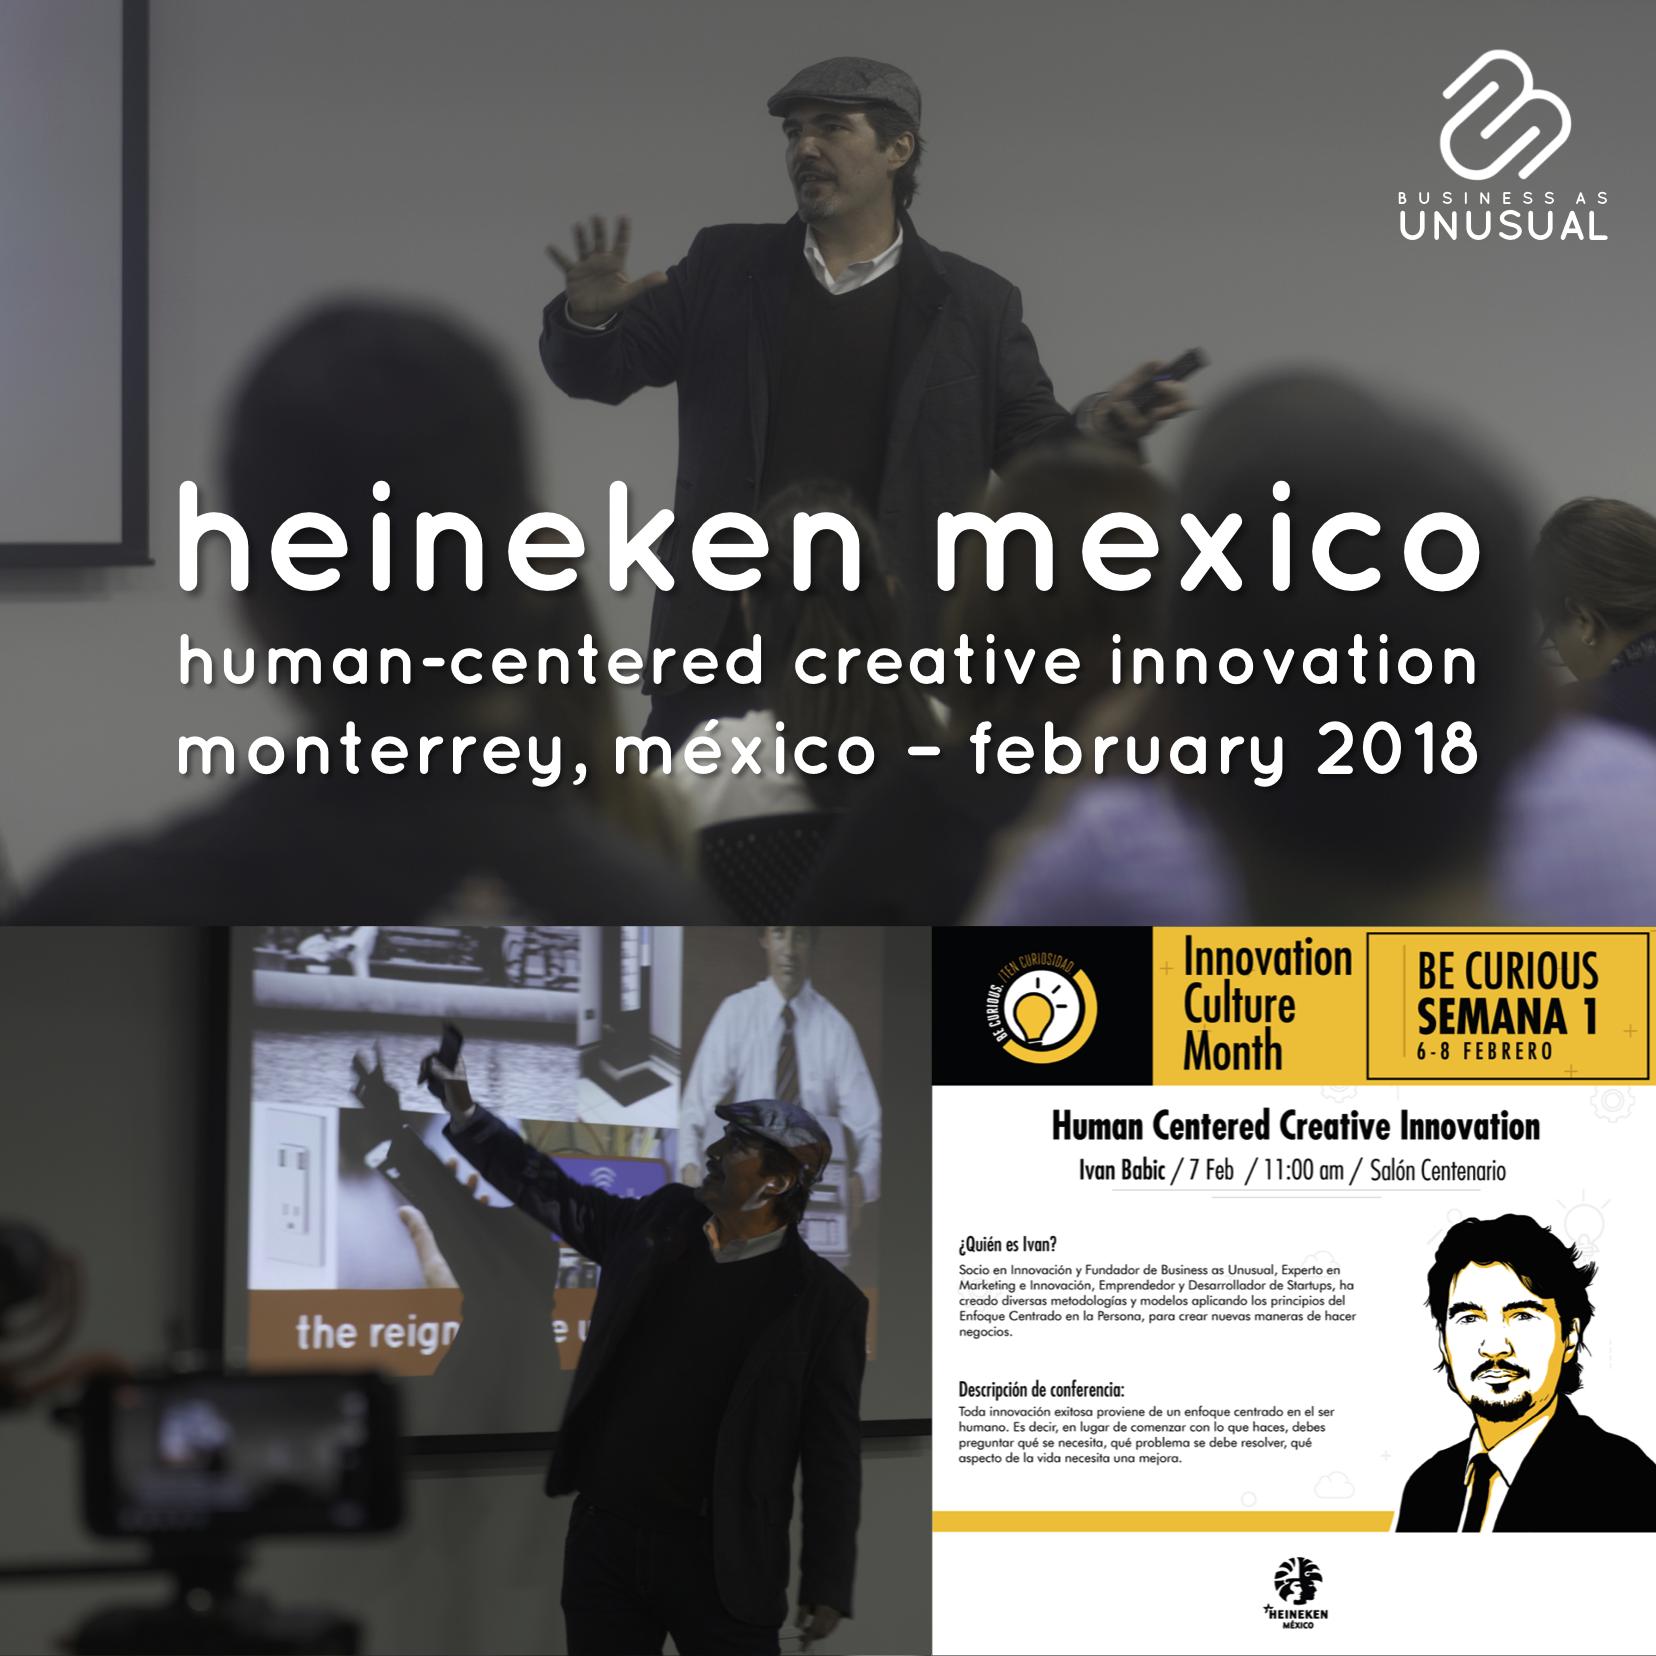 CERVECERÍA CUAUHTÉMOC MOCTEZUMA HEINEKEN MEXICO - Human-Centered Creative Innovation